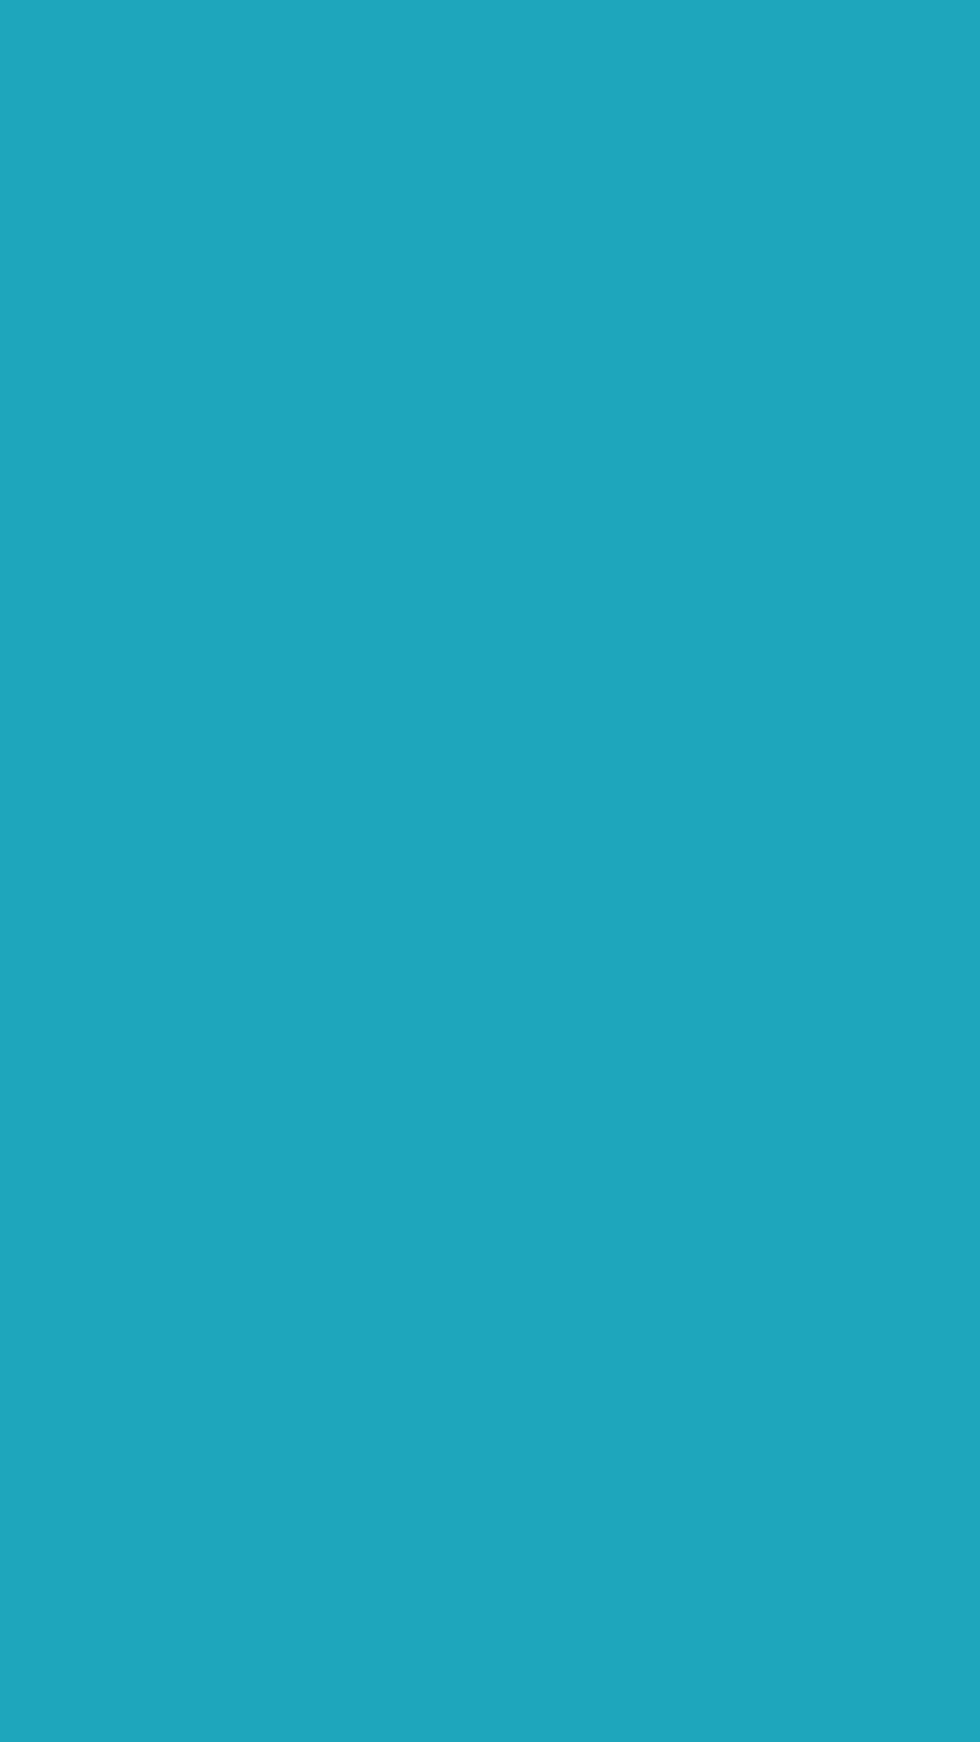 UI_blue_BG.png